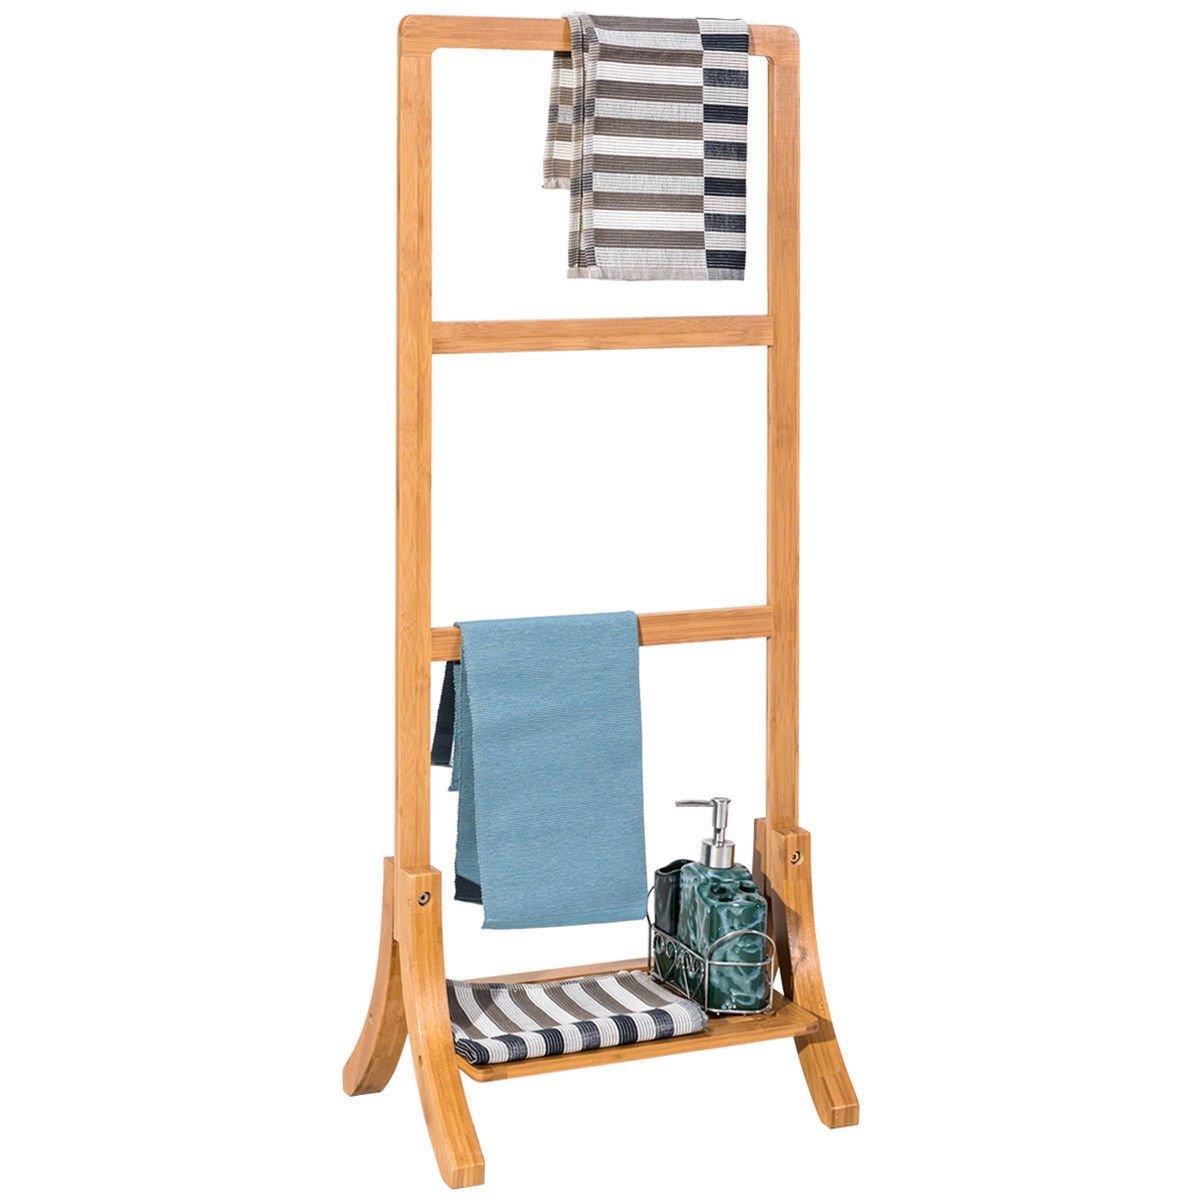 Bamboo Towel Rack Hanger Free Standing W/ Bottom Shelf Bathroom Storage